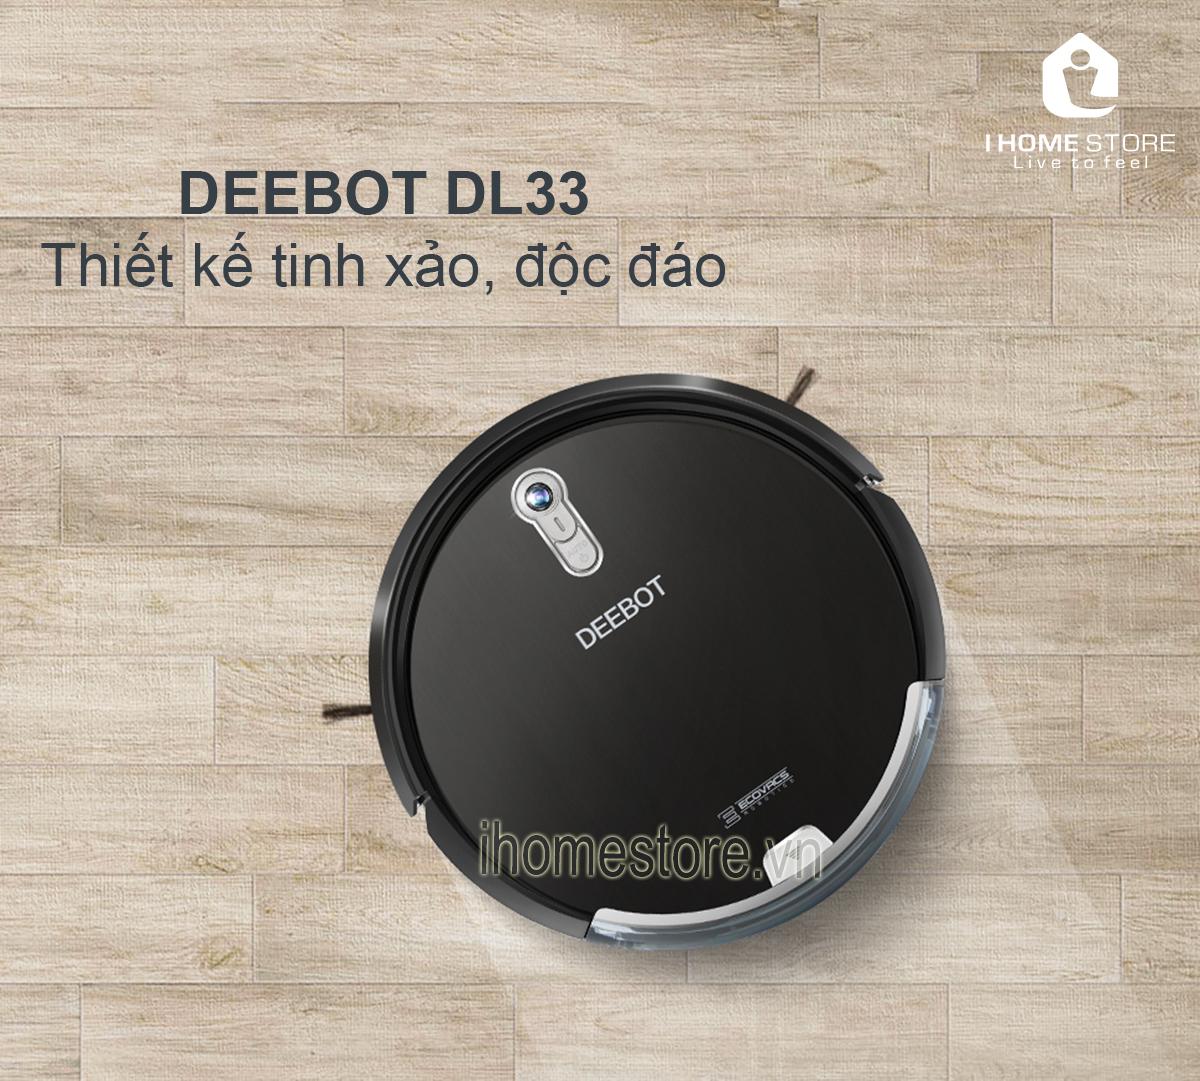 robot hut bui lau nha ecovacs deebot dl33 - ihomestore.vn